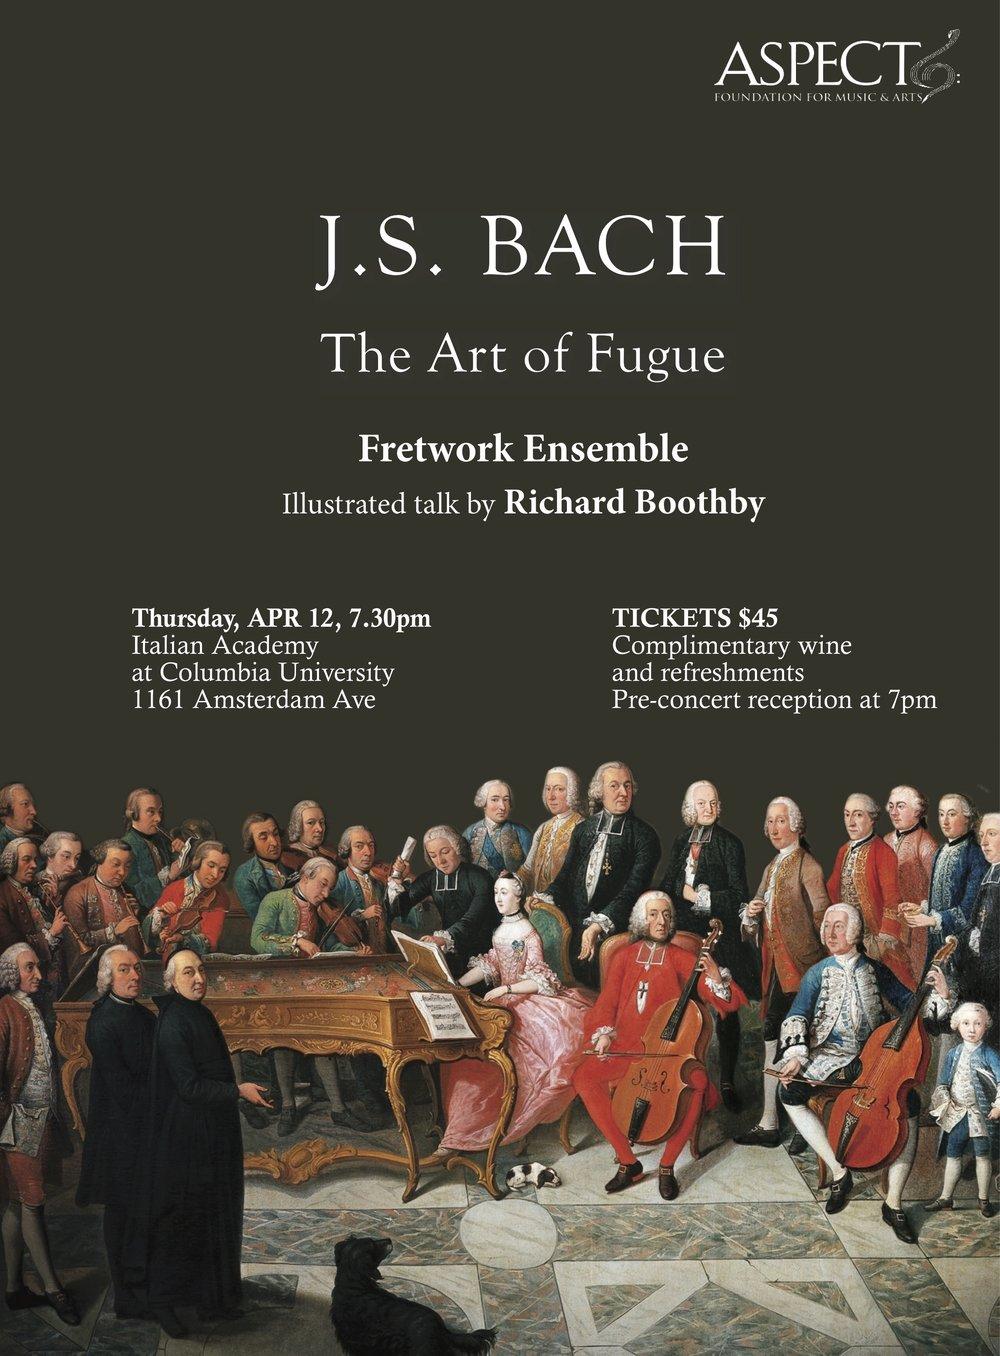 Dasha Cohen-Aspect-Bach-The Art of Fugue 16x24 poster DM.jpg